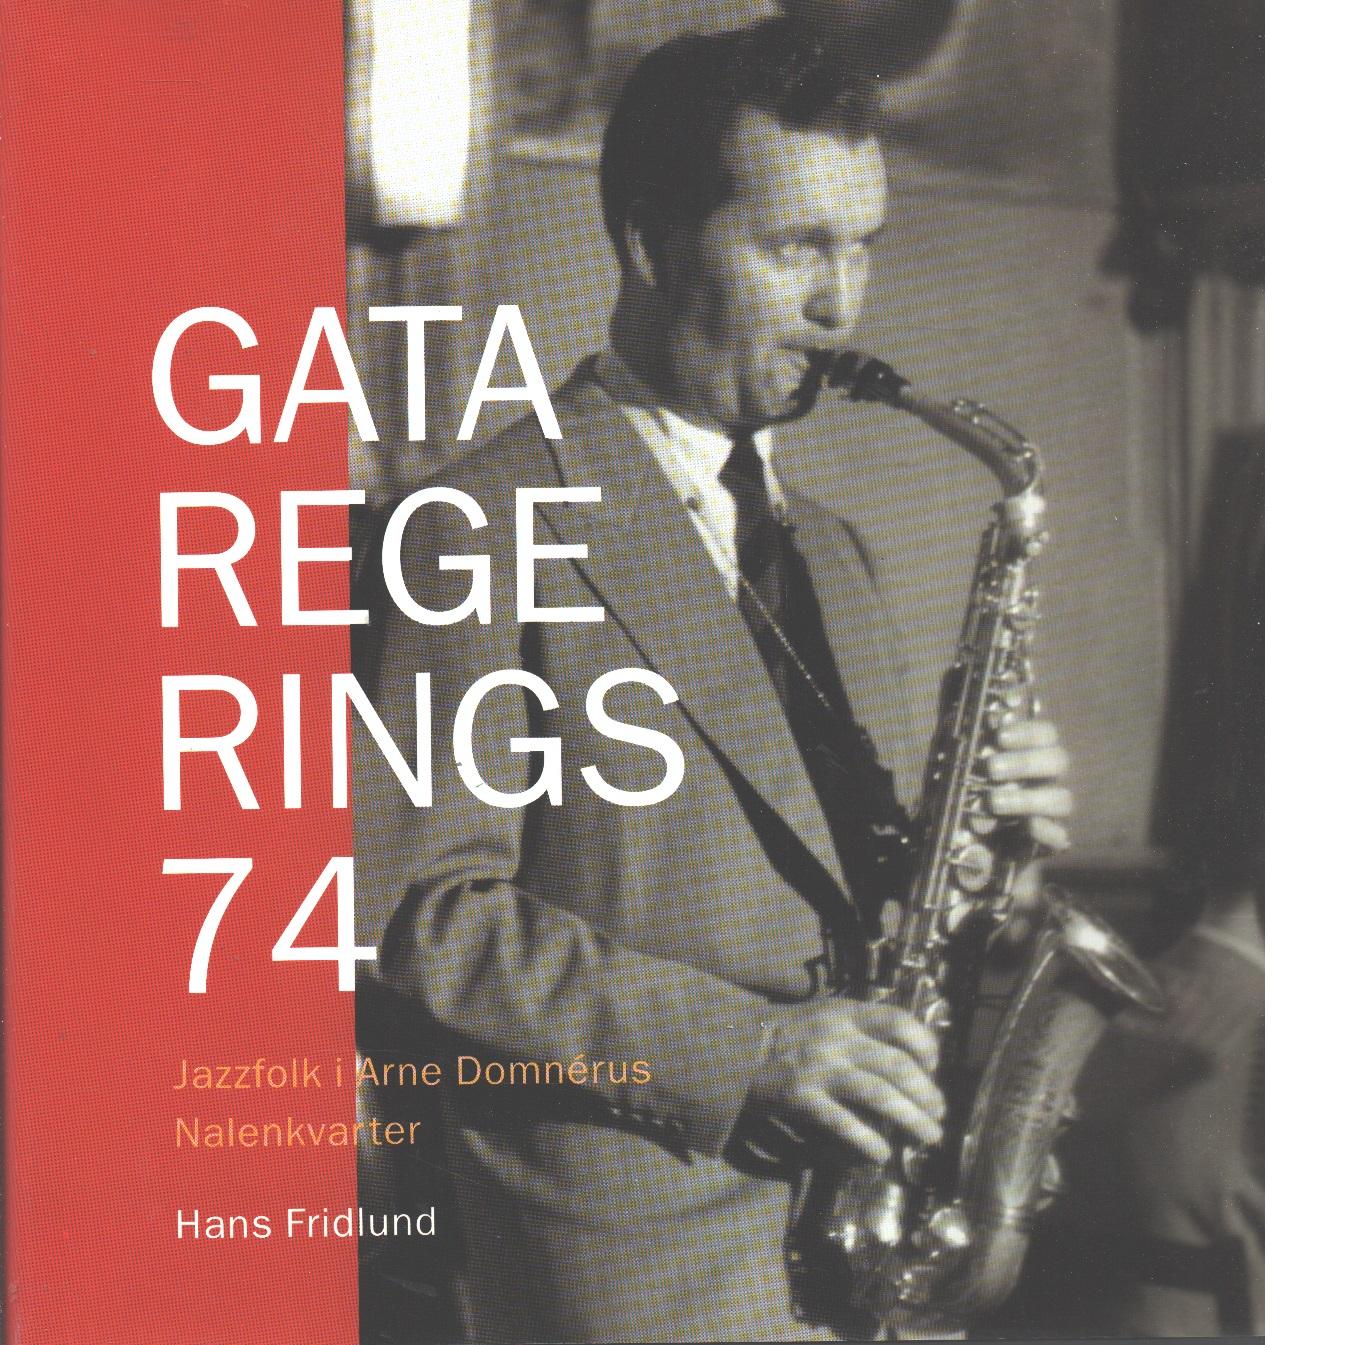 Gata Regerings 74 : jazzfolk i Arne Domnérus Nalenkvarter - Fridlund, Hans